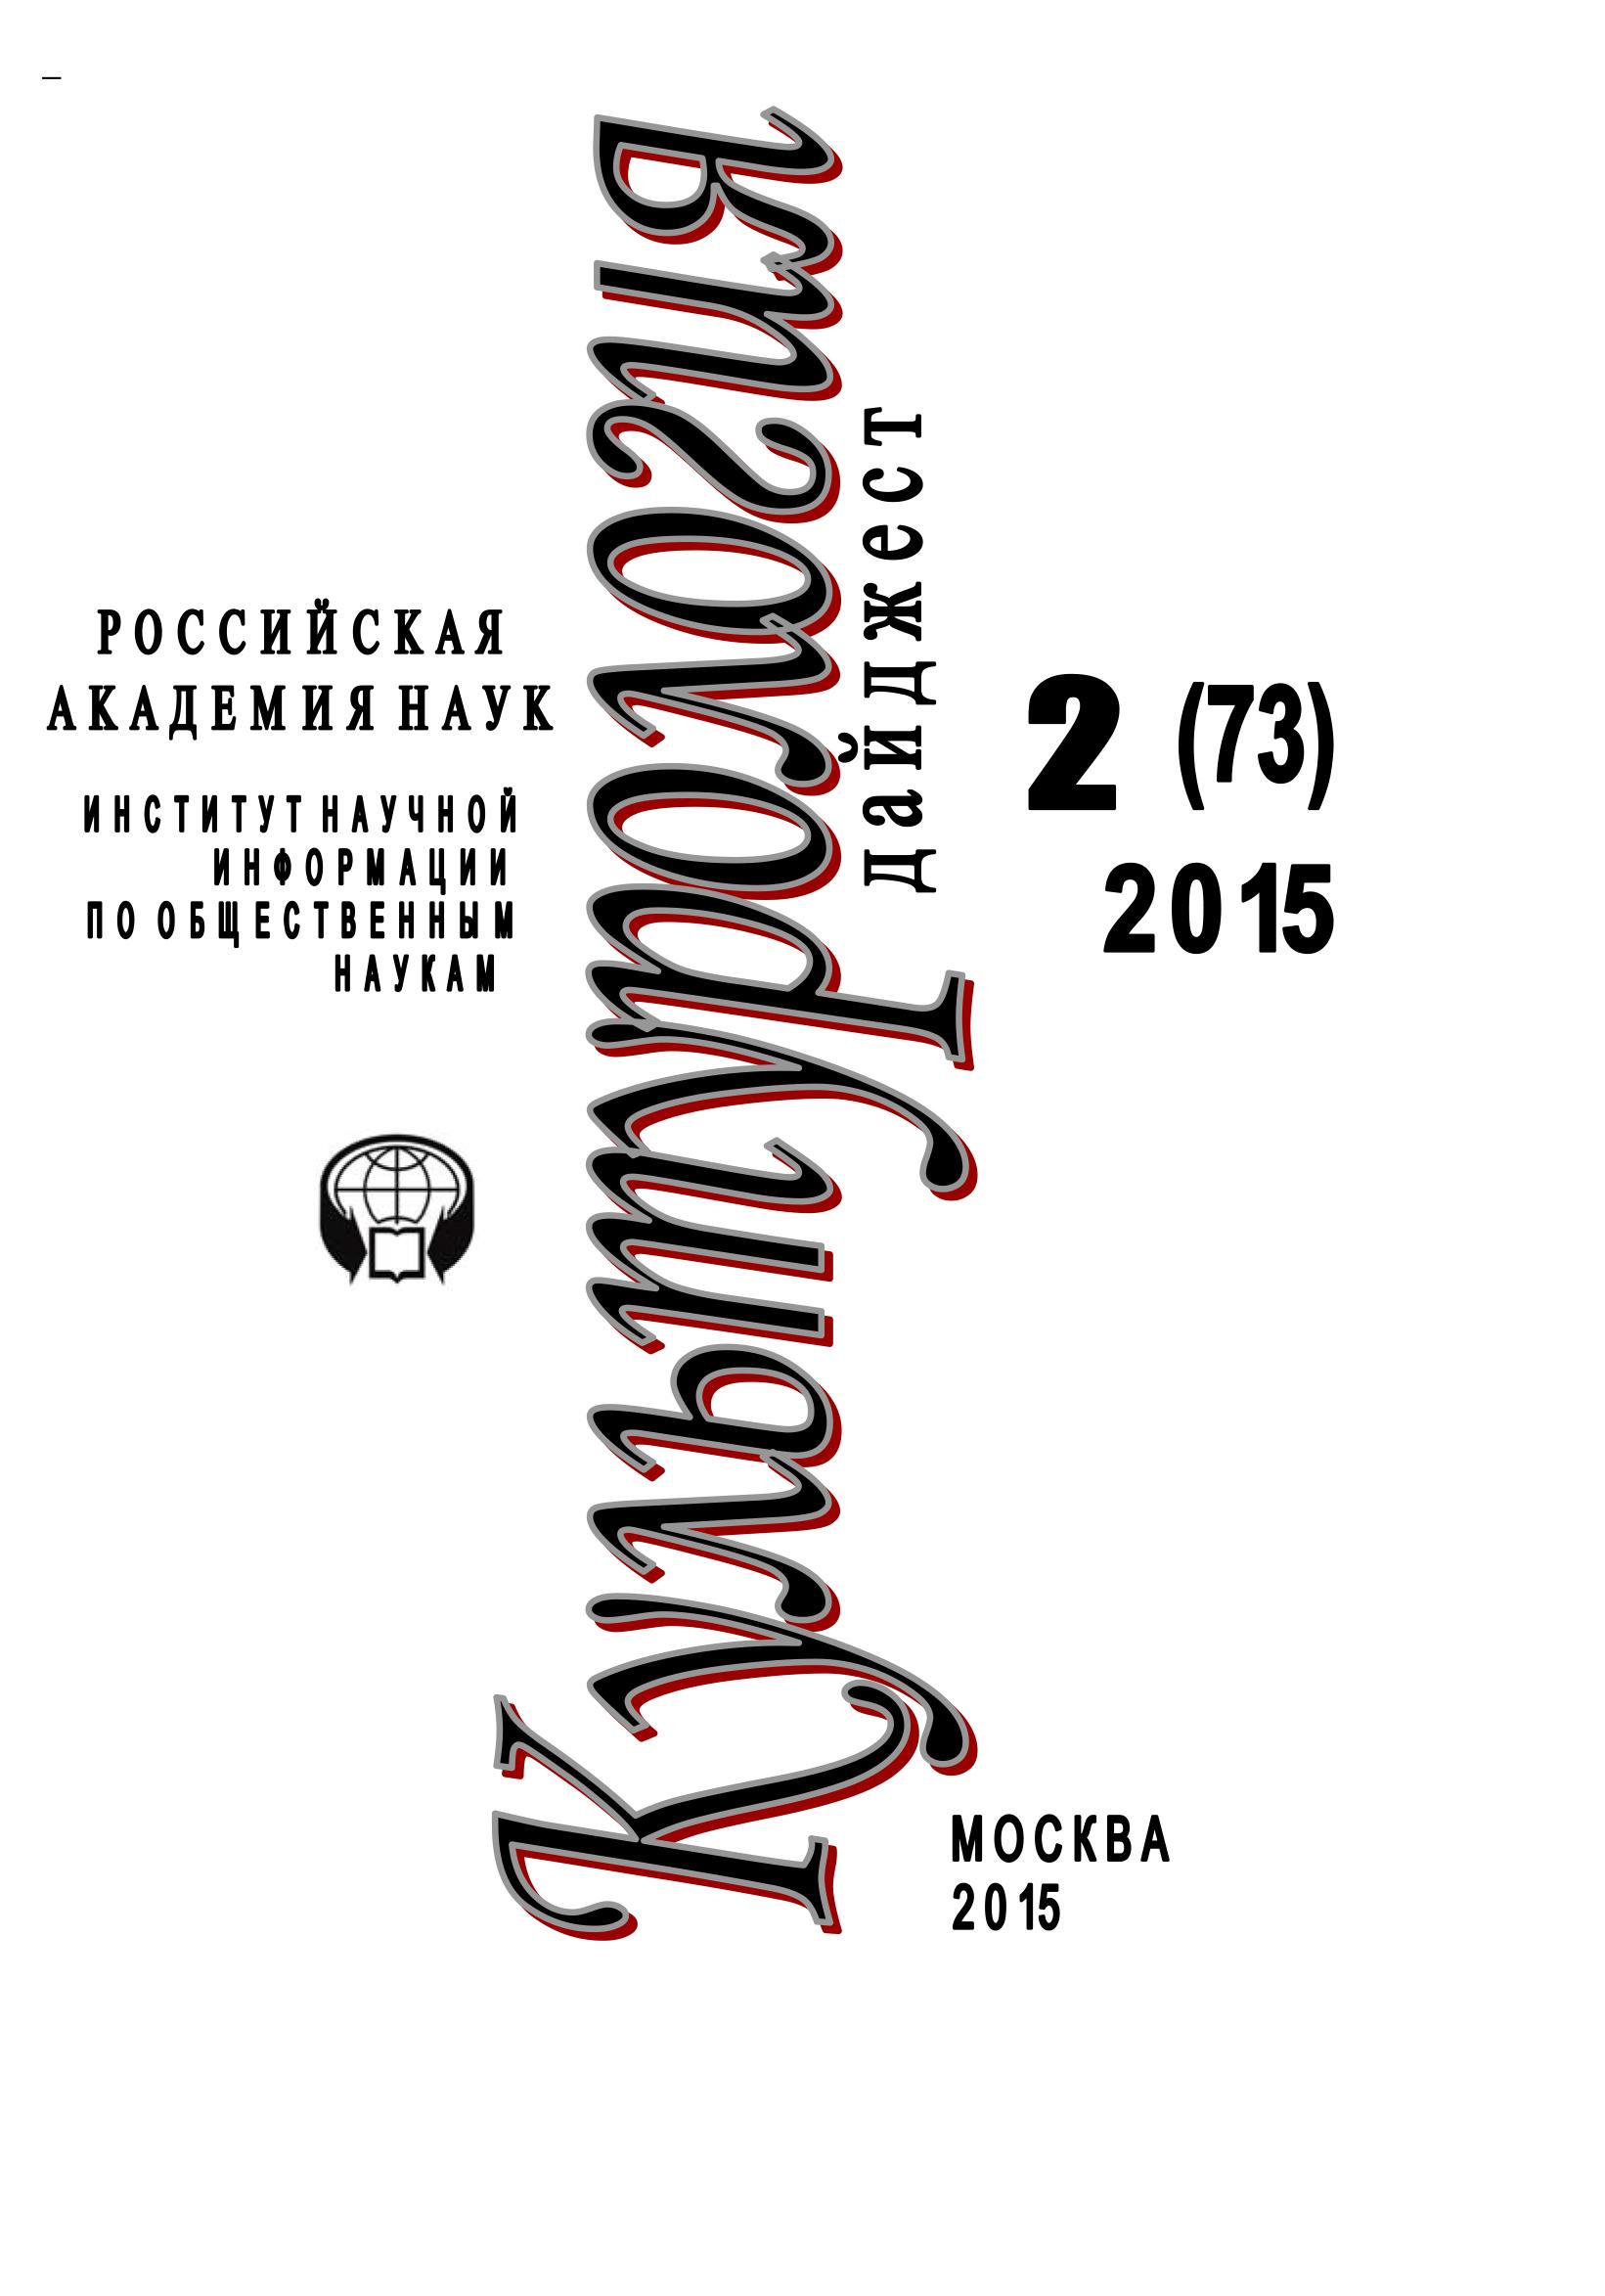 Ирина Галинская Культурология. Дайджест №2 / 2015 ирина галинская культурология дайджест 1 2015